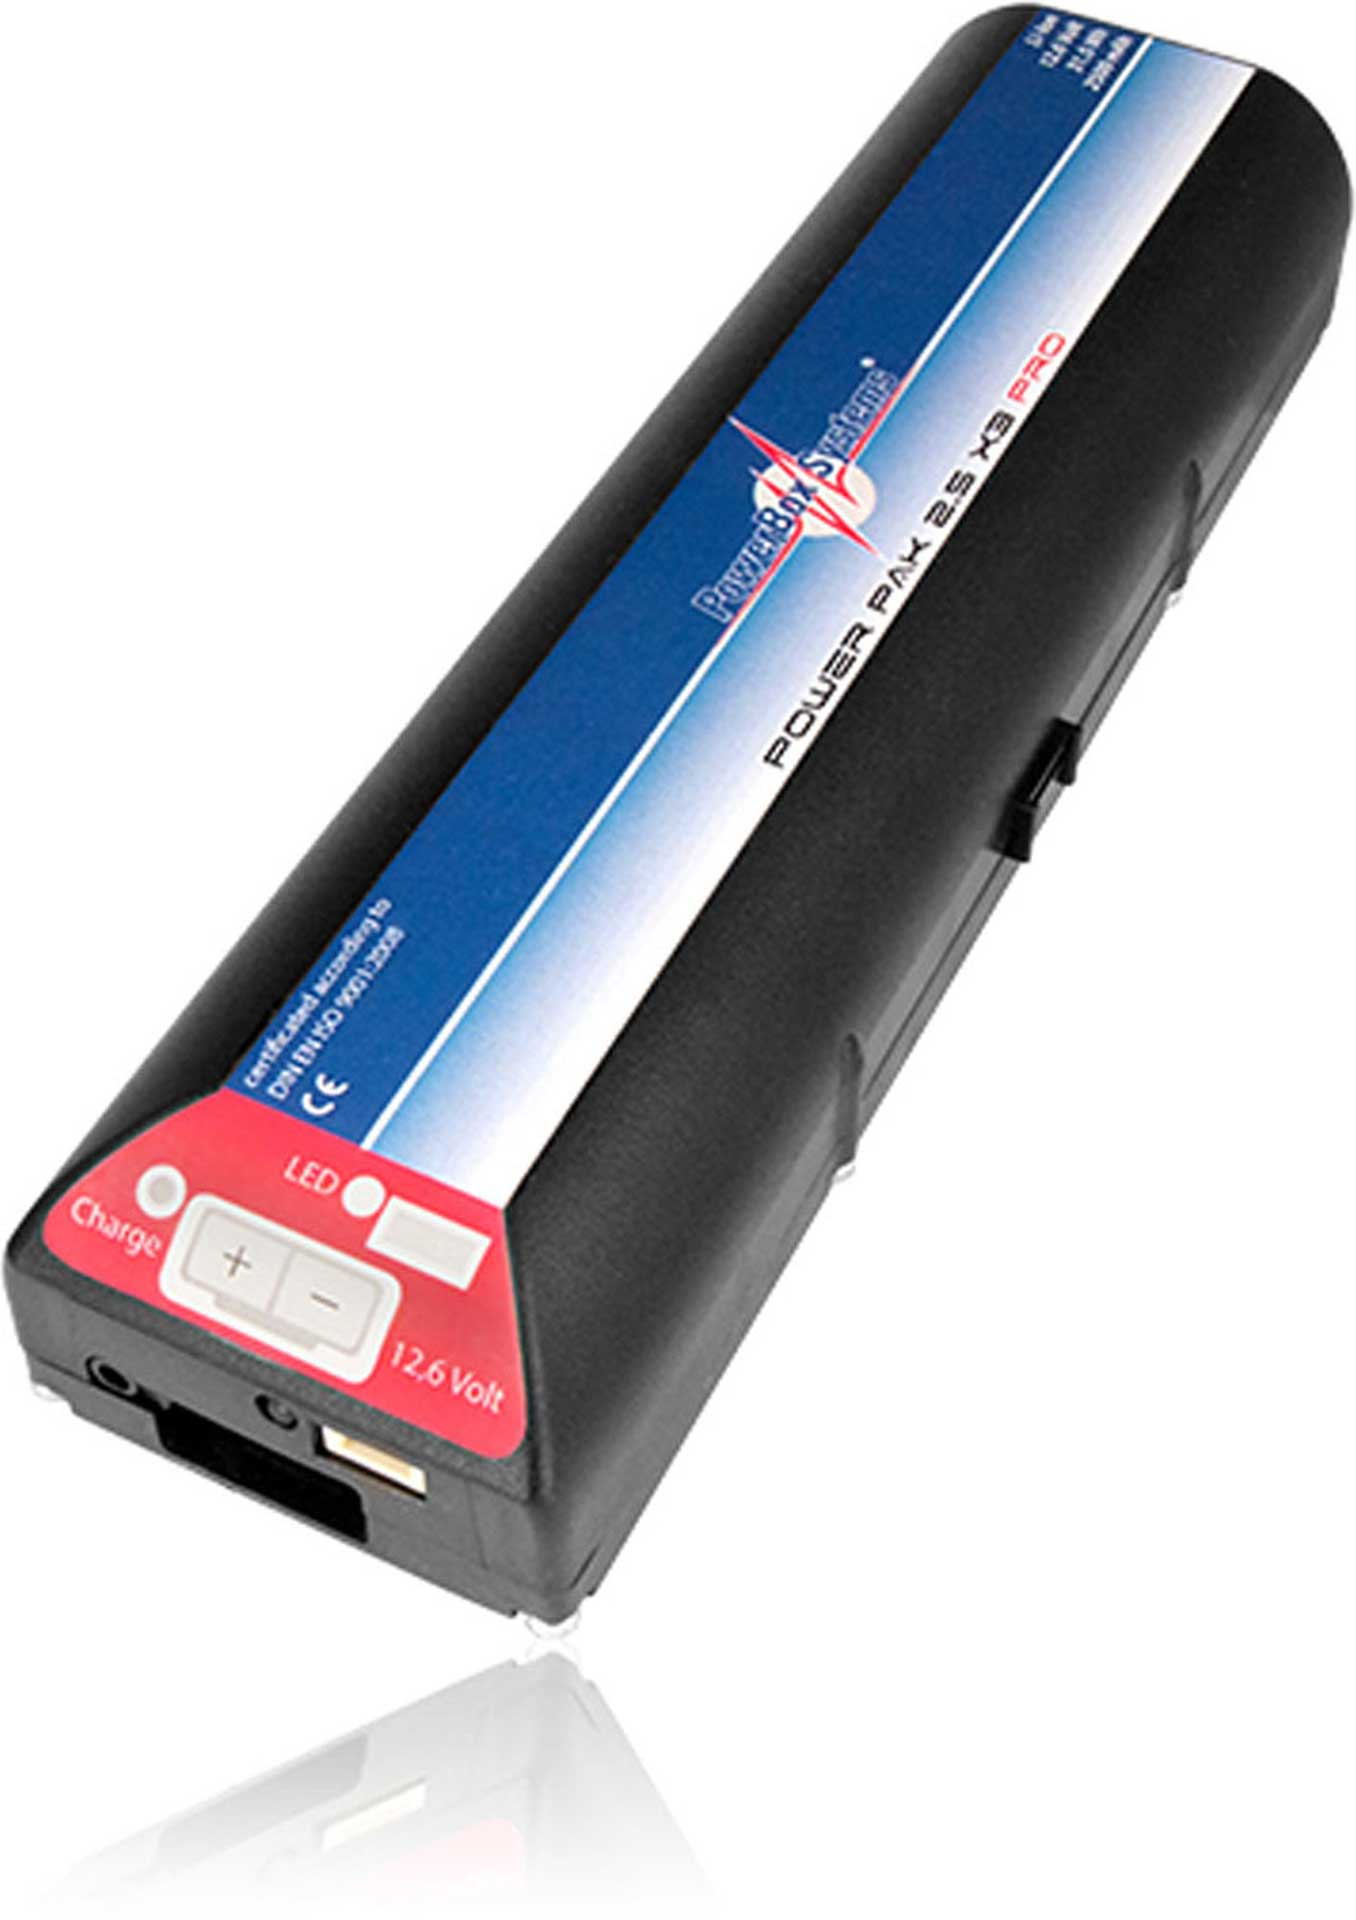 POWERBOX SYSTEMS POWERPAK 2.5X3 PRO 2500MAH 11,1V